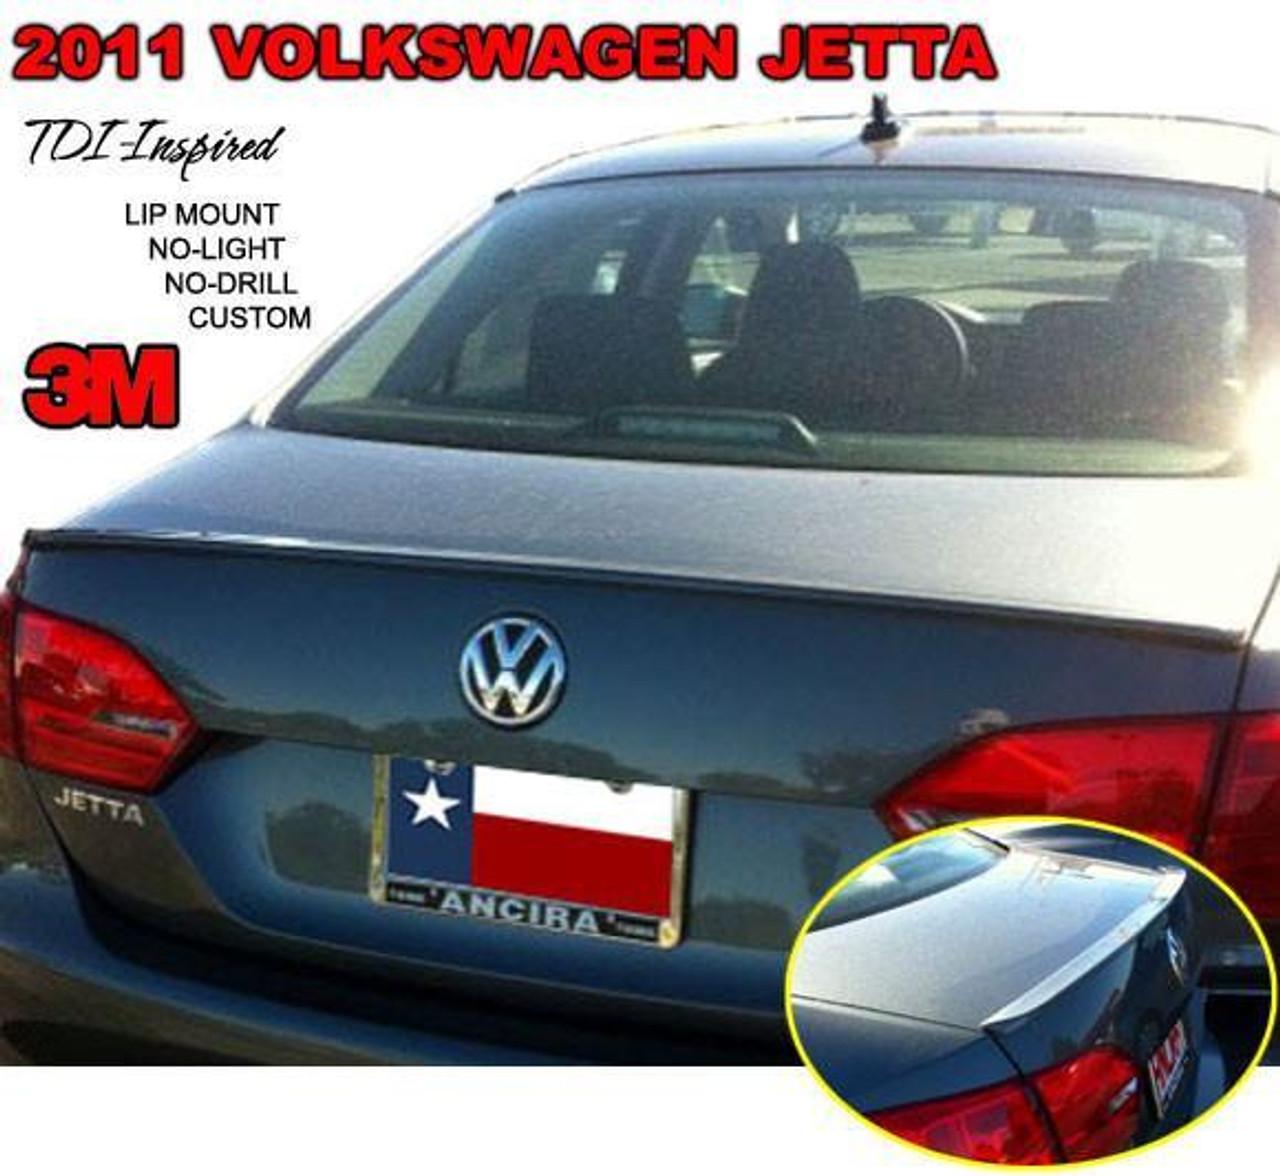 Volkswagen Jetta 2011 2014 Custom Lip No Light Rear Trunk Spoiler 707 Motoring Auto Parts Accessories